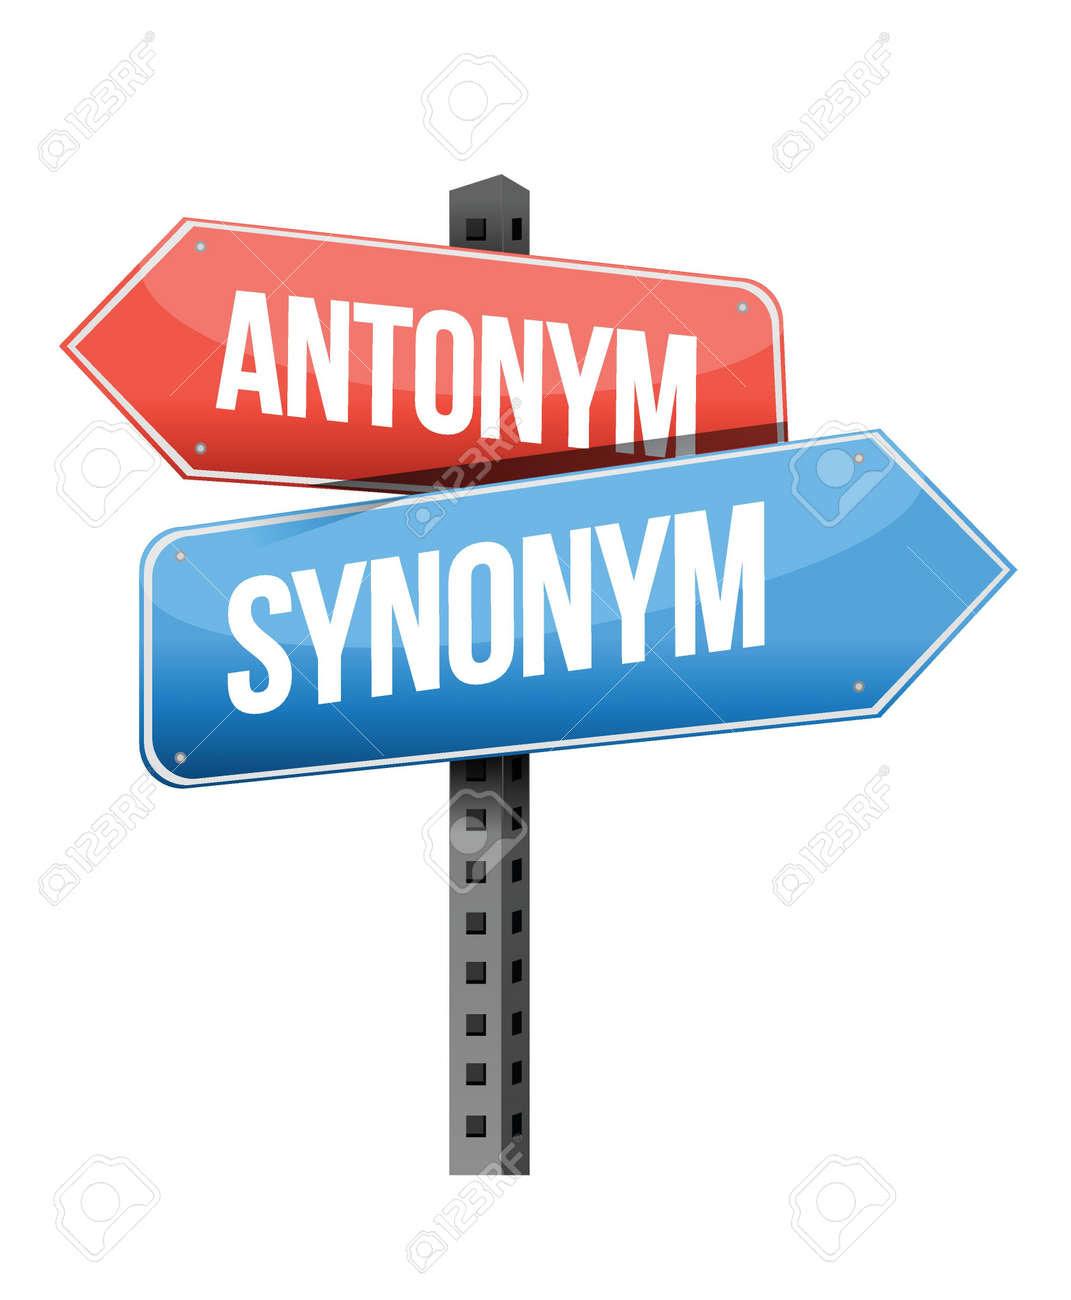 Image result for antonym synonym